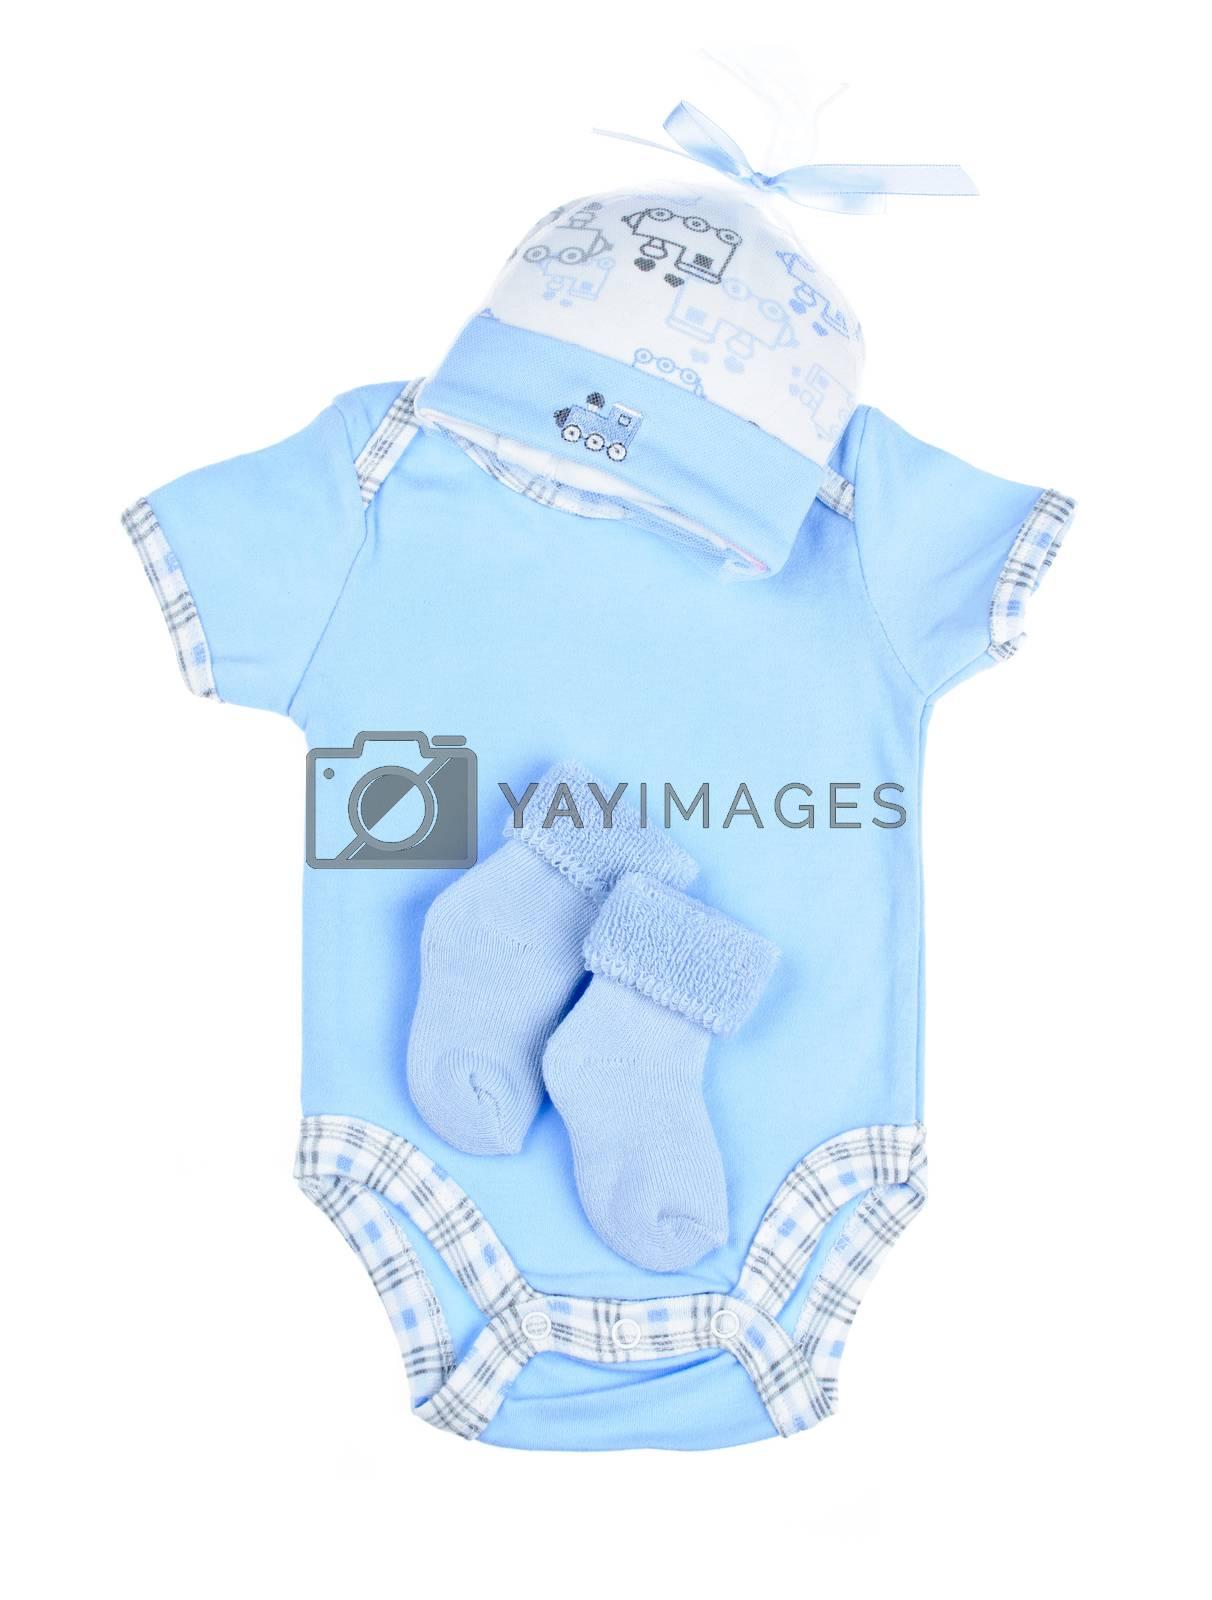 Blue infant boy clothing for baby shower isolated on white background